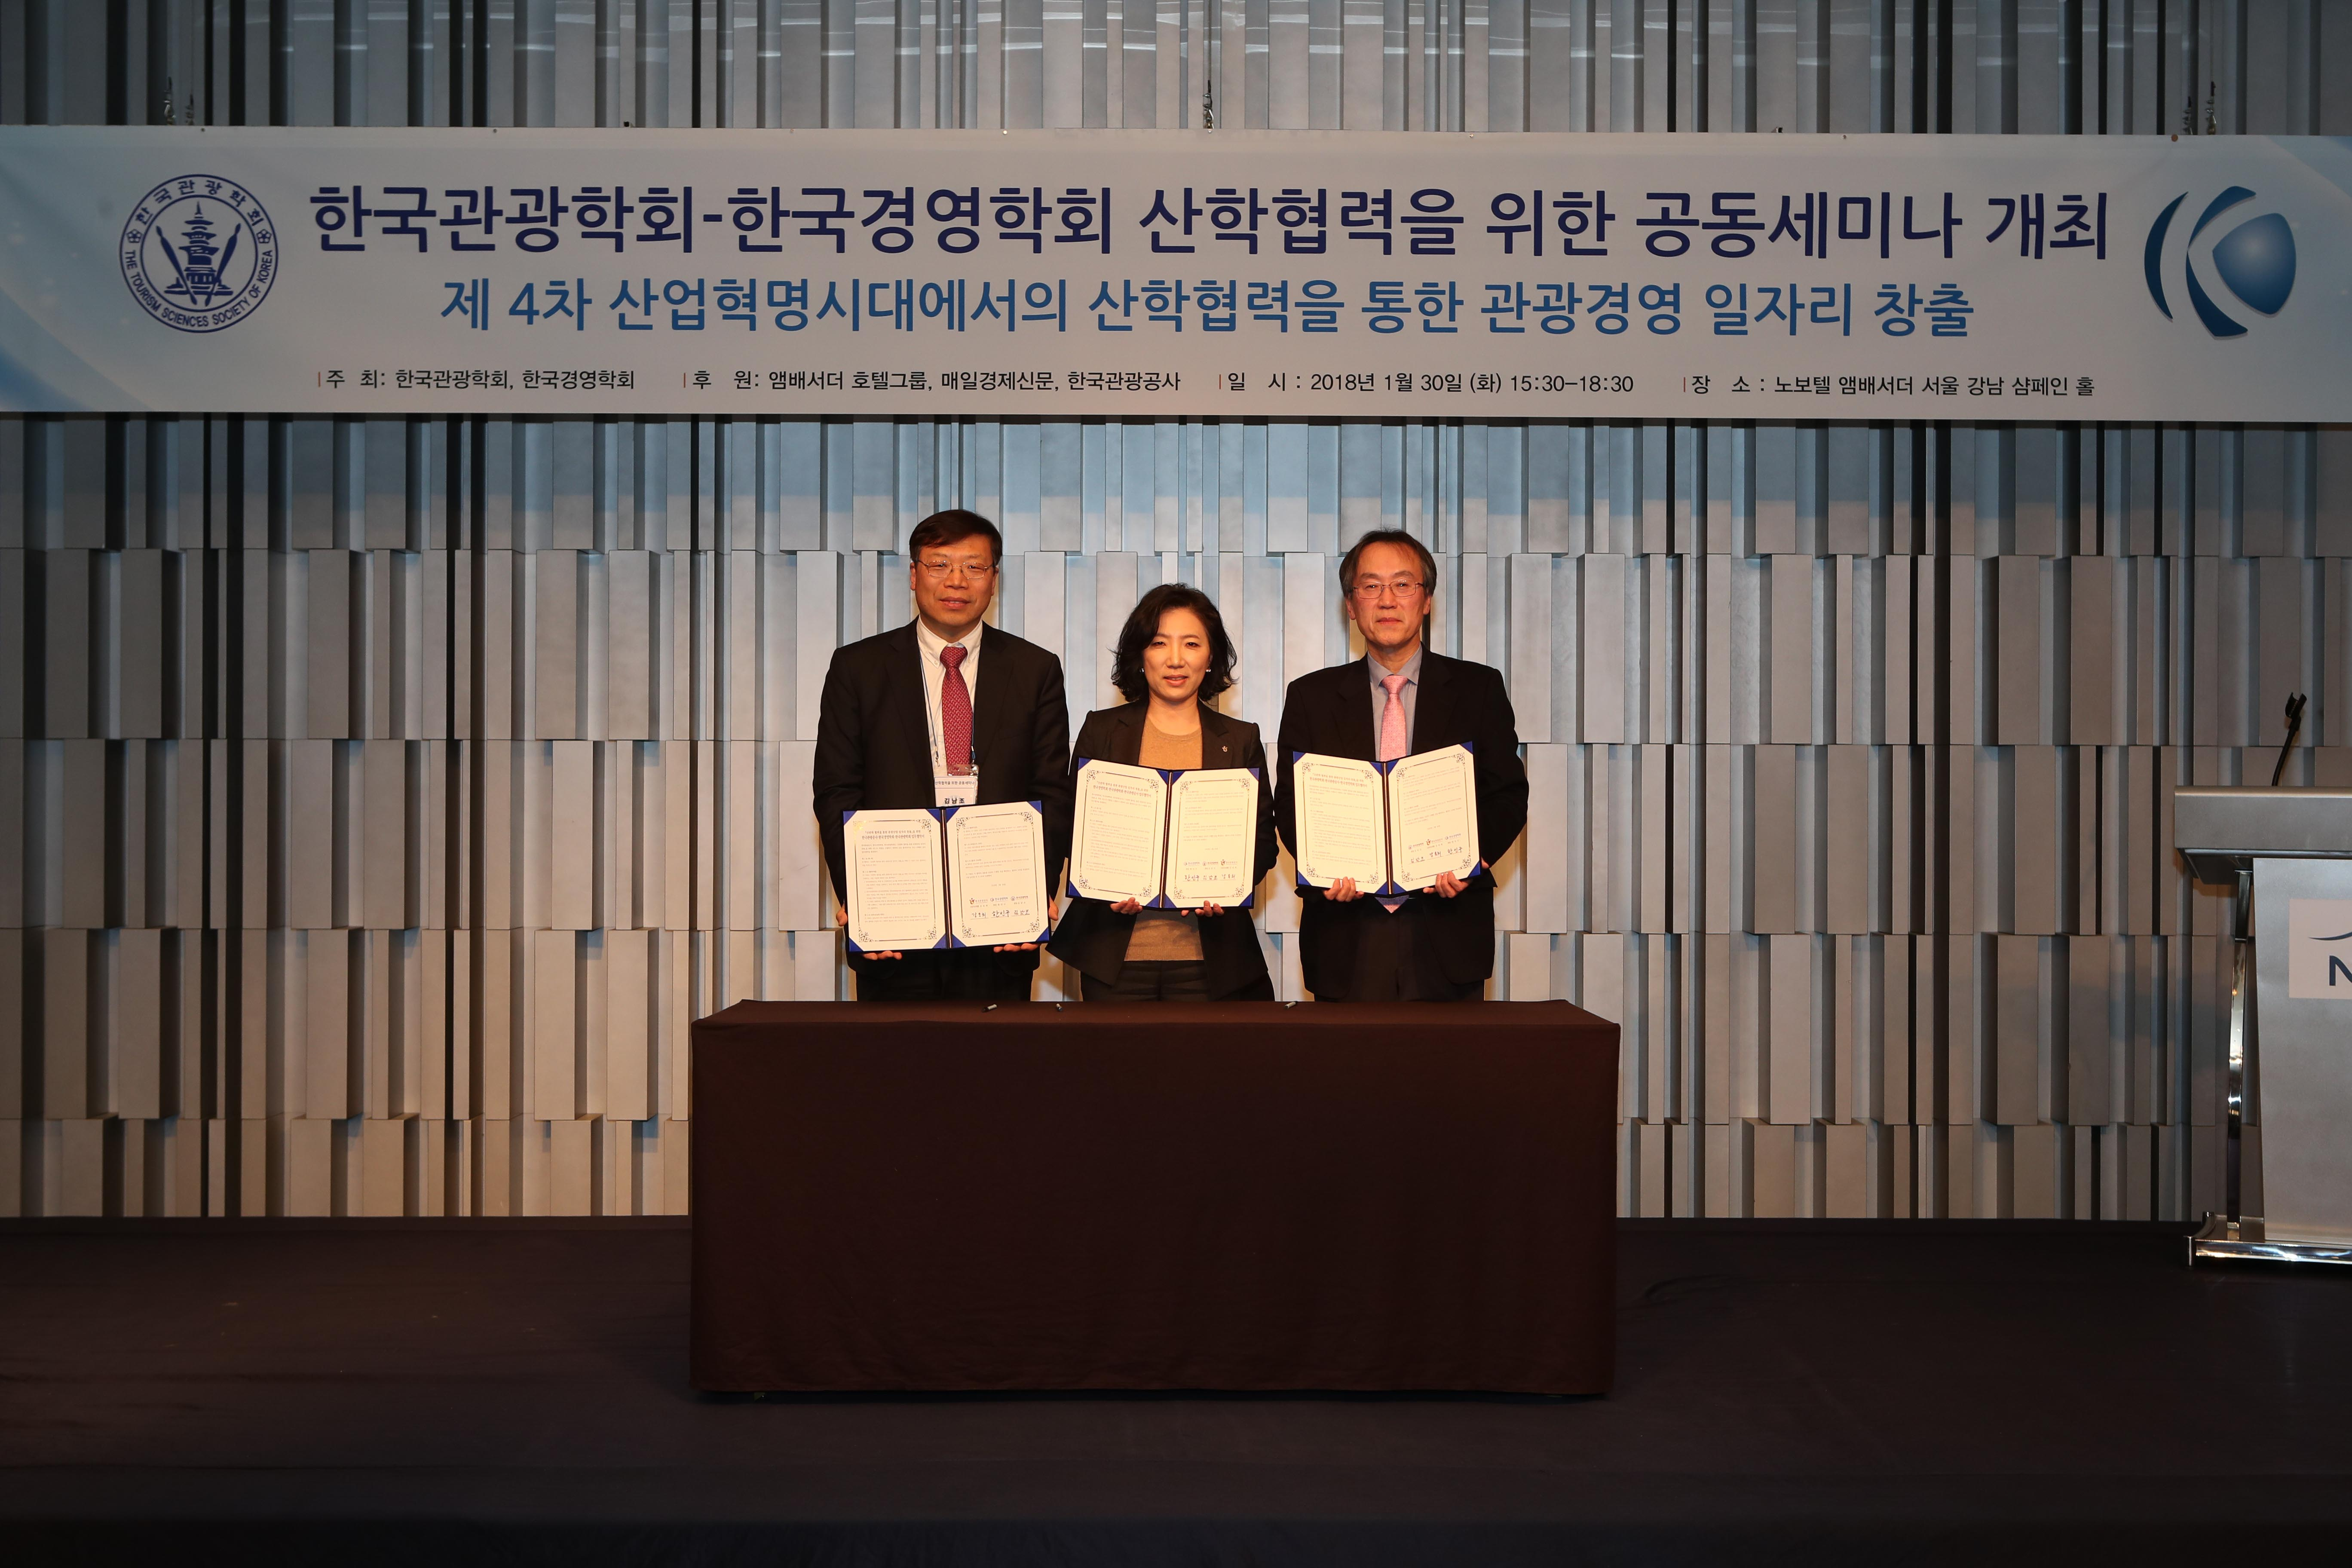 KTO, 산관학 협력을 통한 관광산업 일자리 창출 MOU 체결